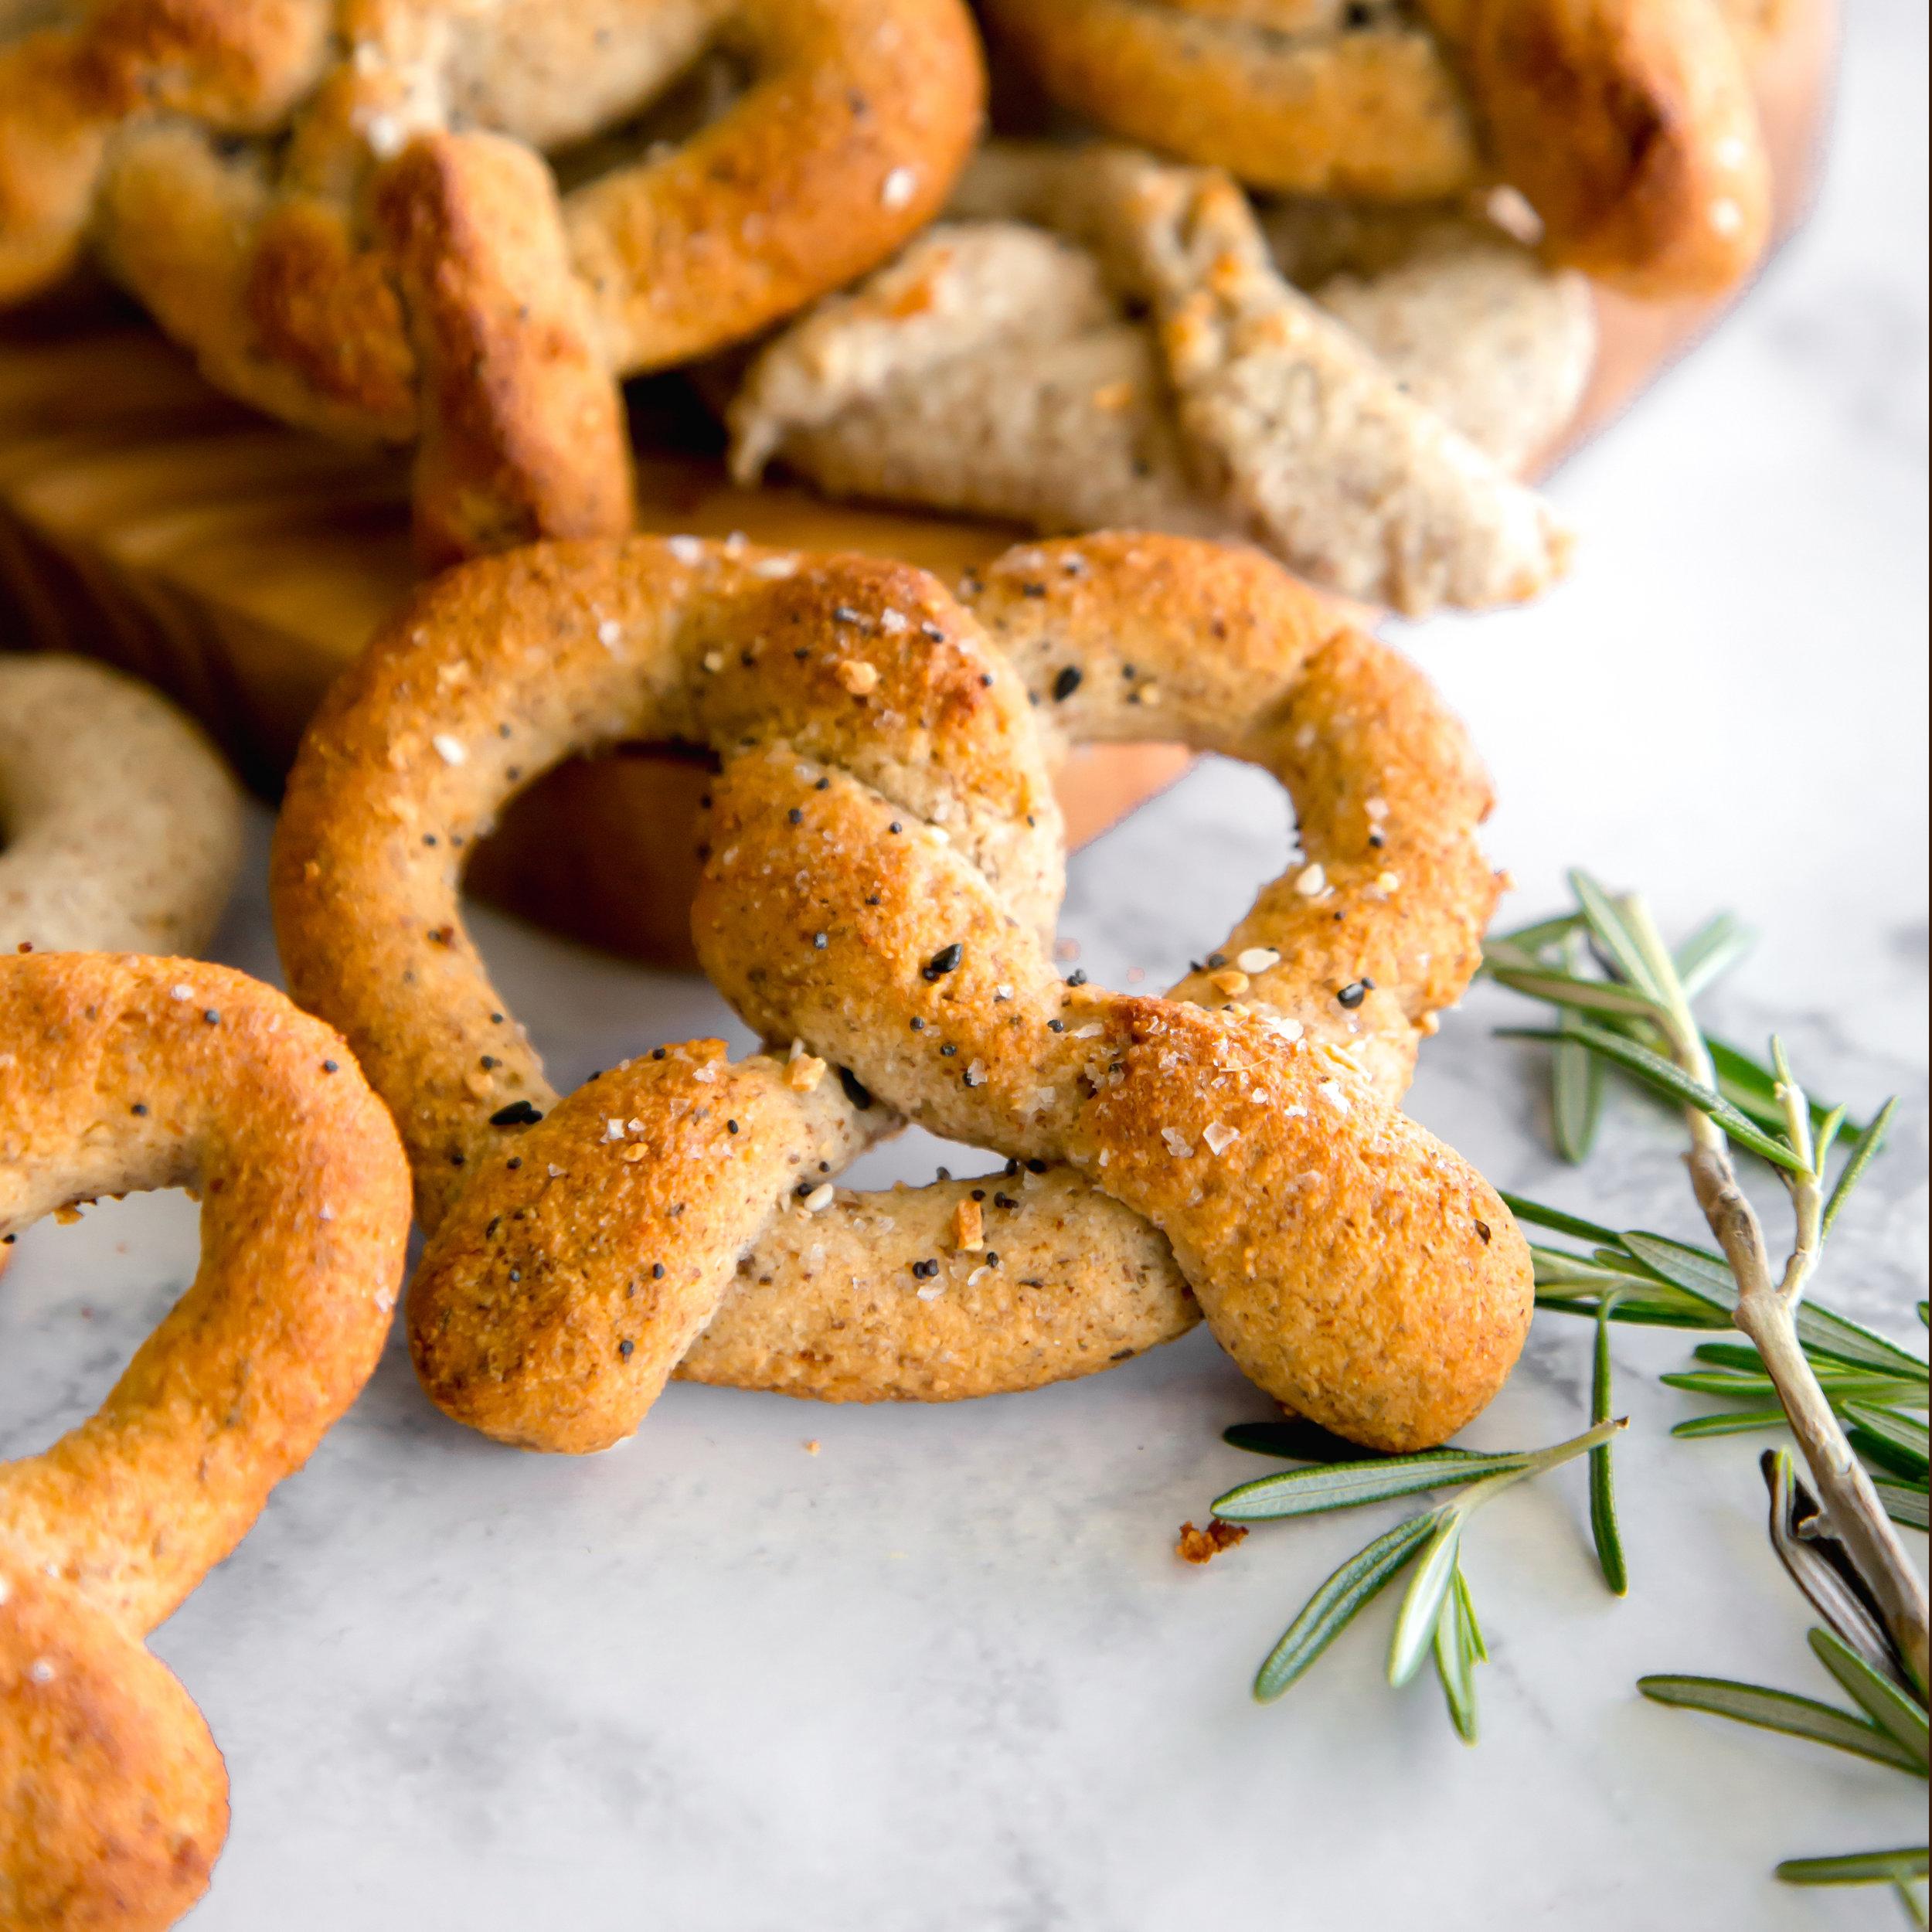 KNOW_project2_pretzels_crop_6.jpg